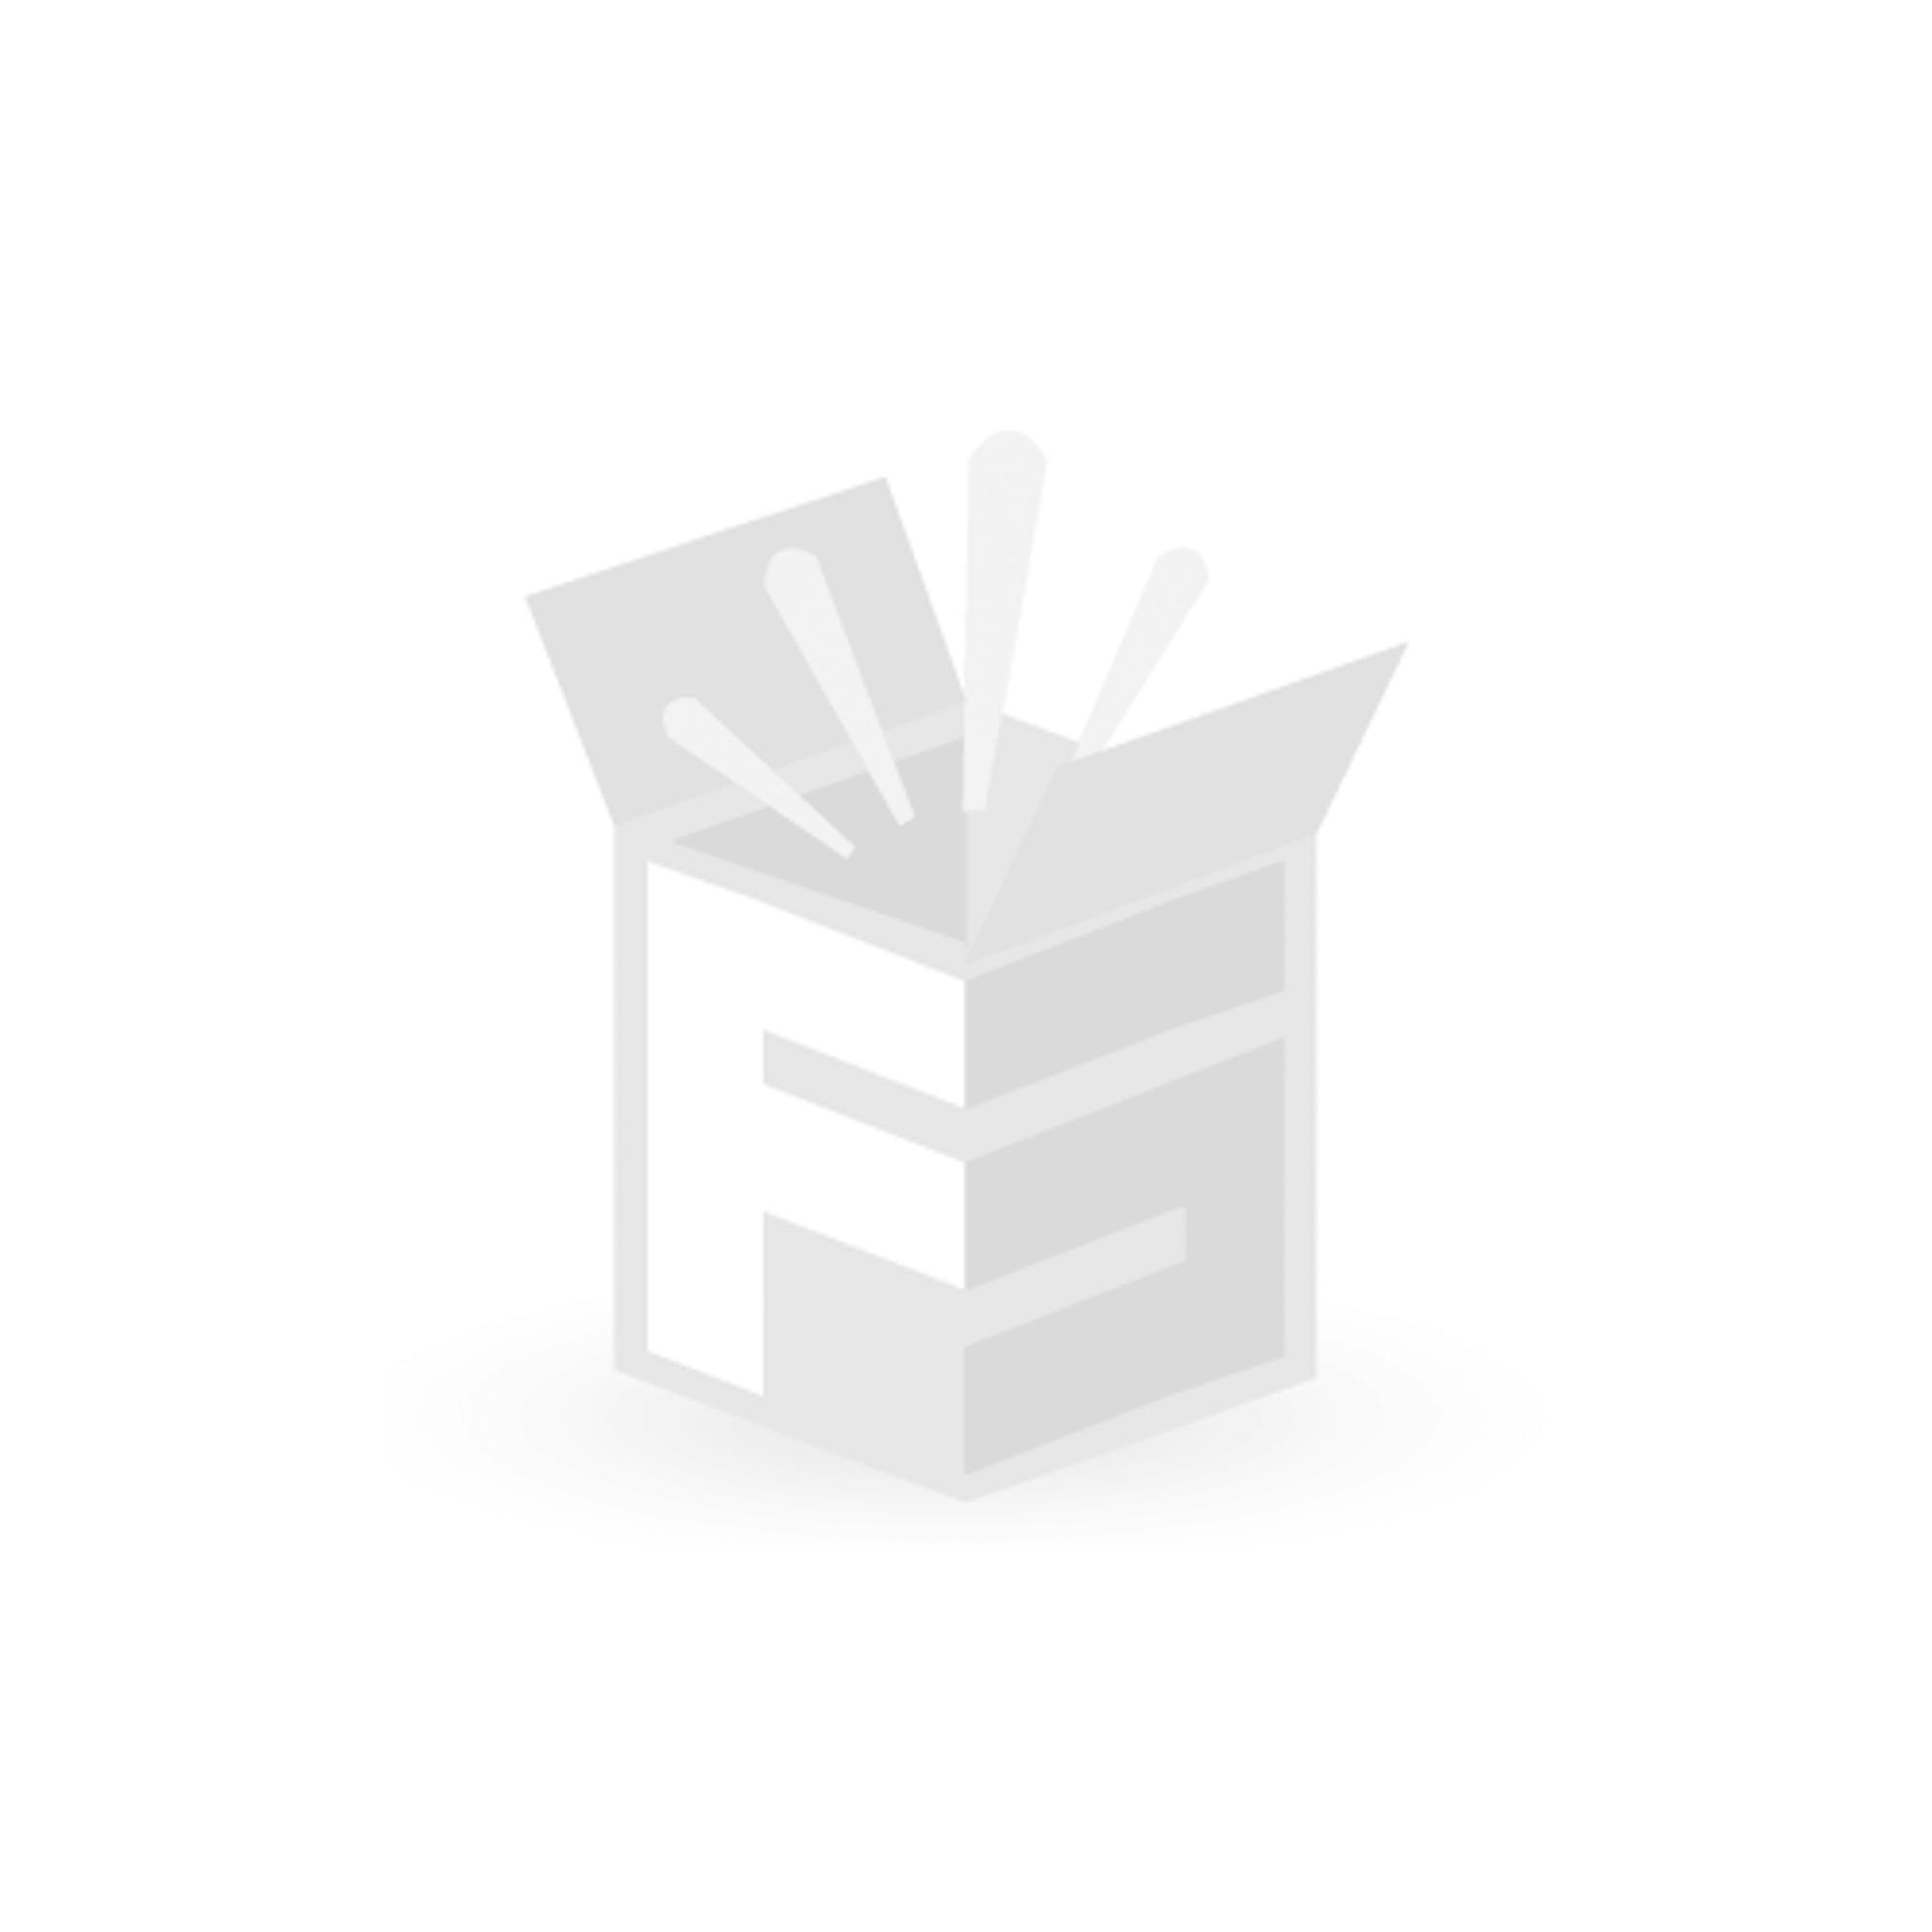 philips kaffeemaschine hd8913 11 saeco incanto. Black Bedroom Furniture Sets. Home Design Ideas